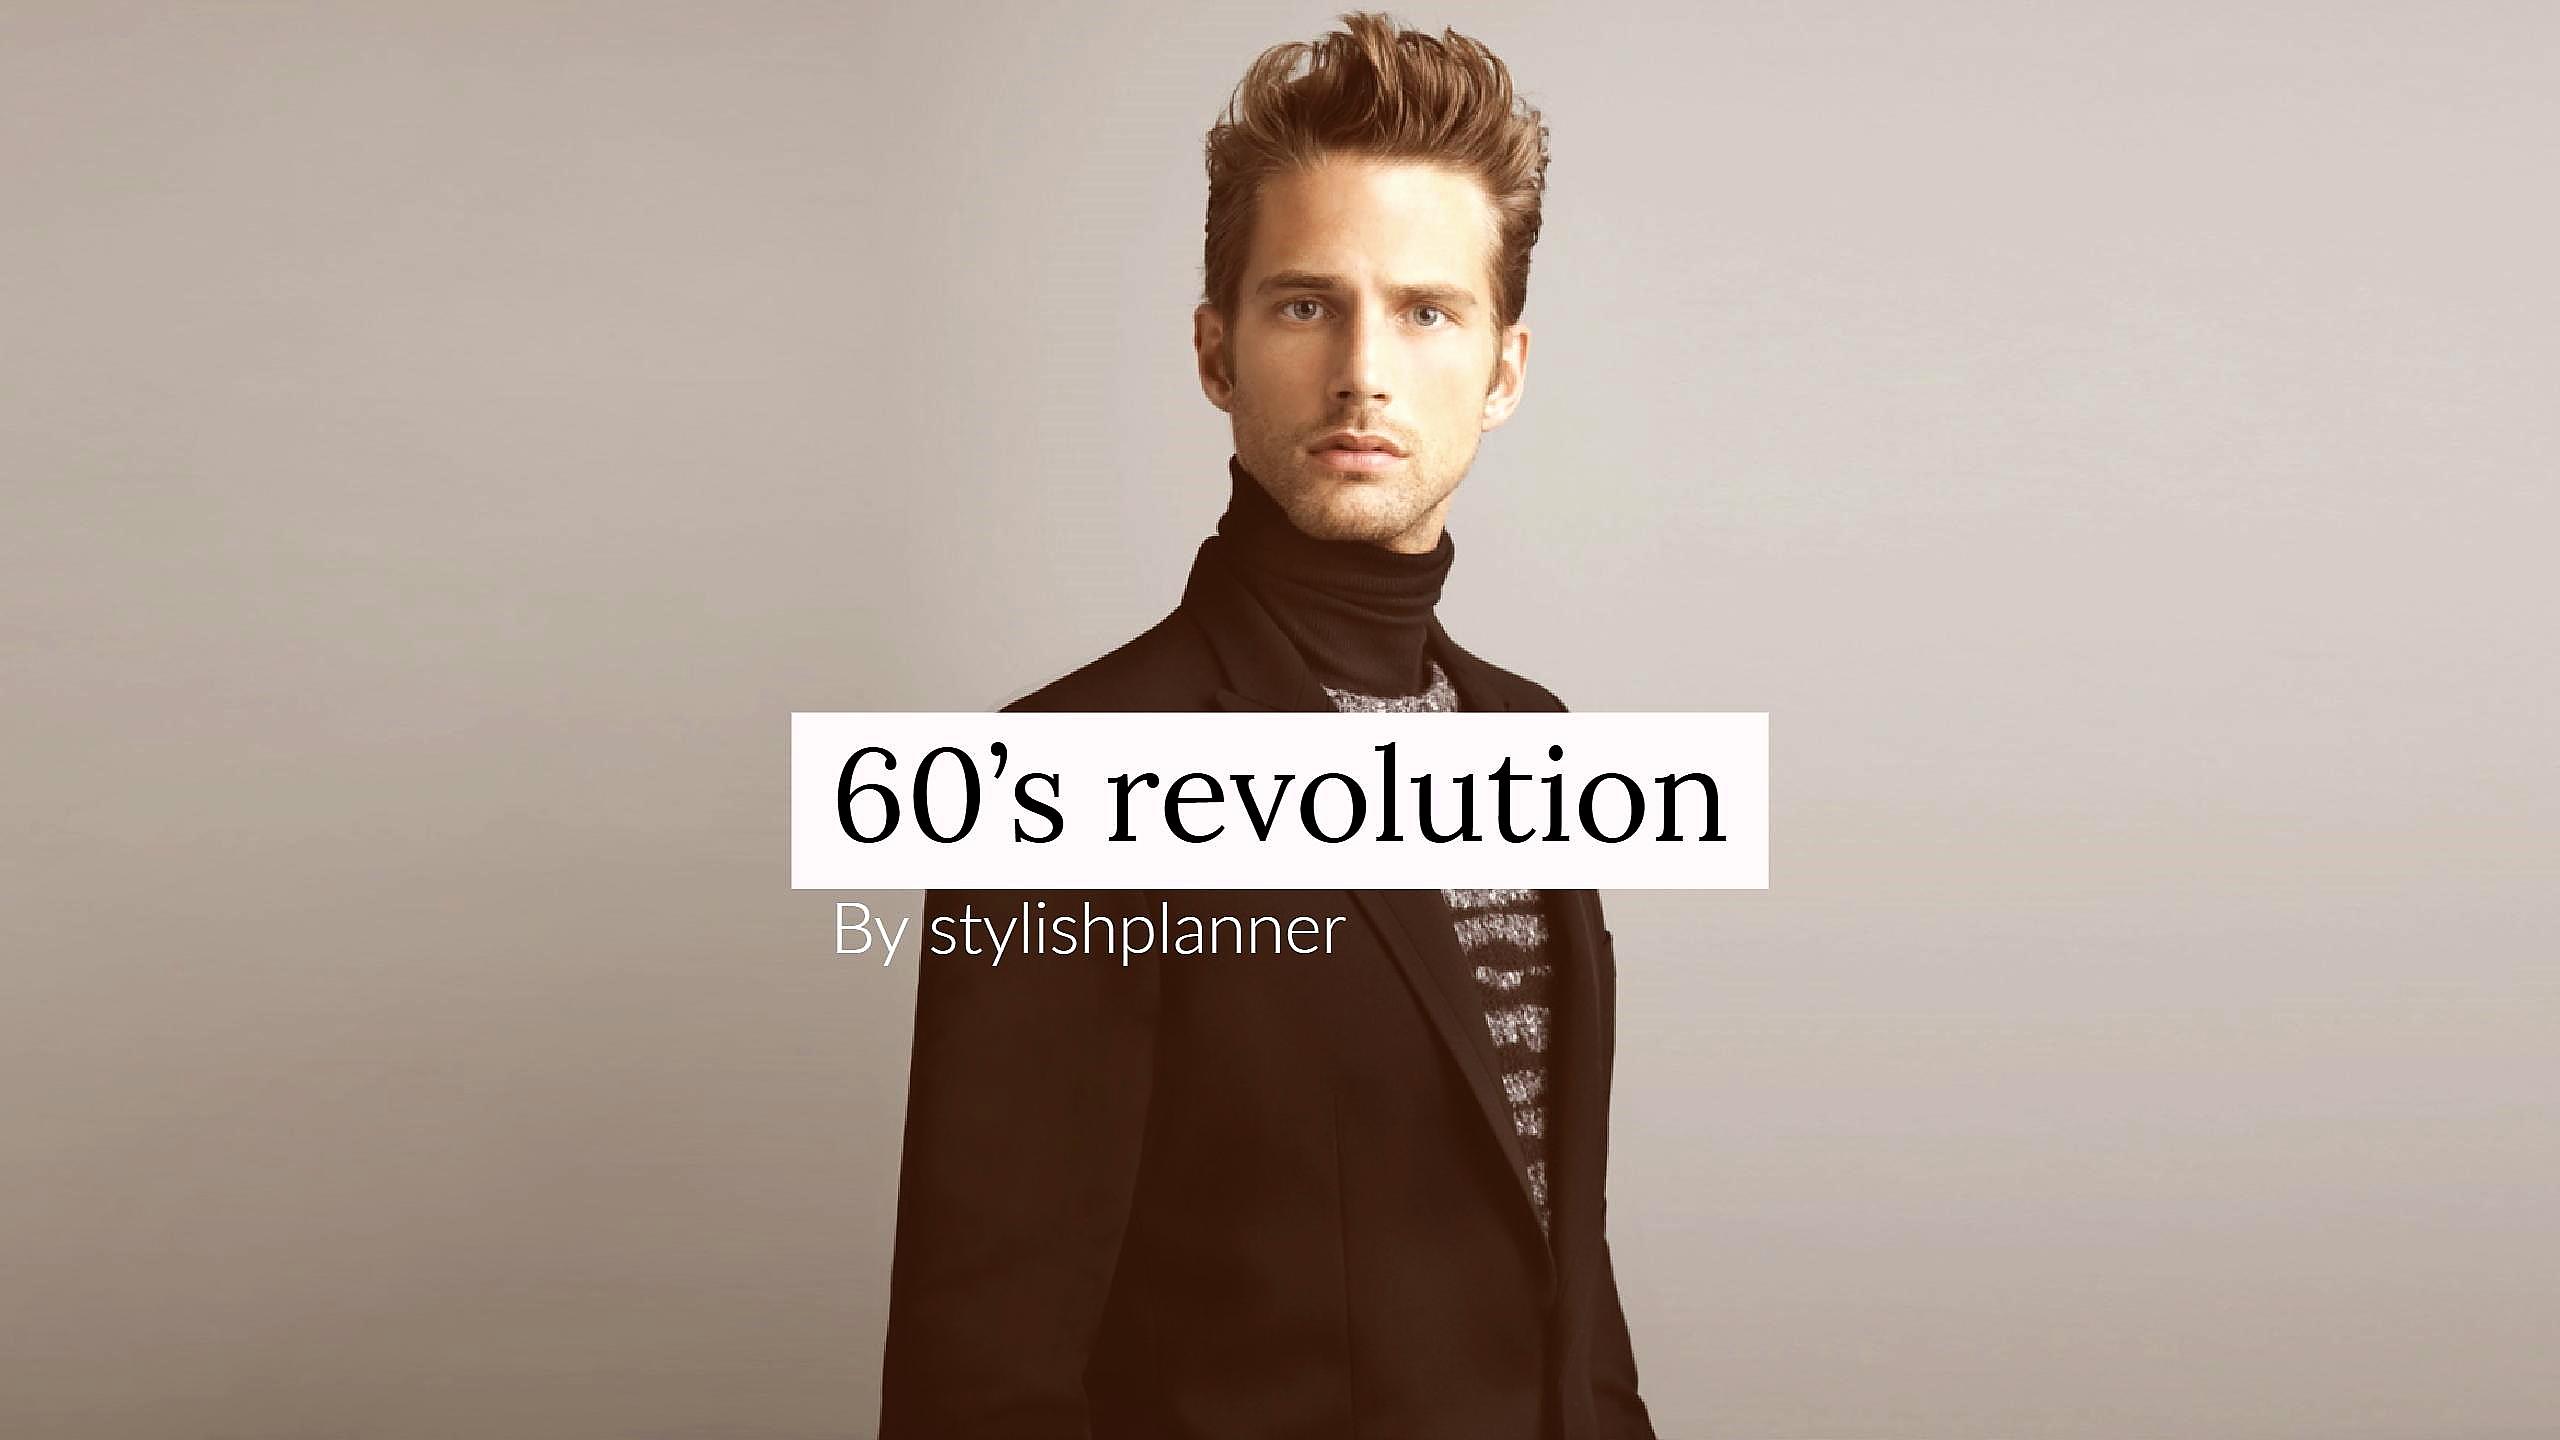 Revolucion 60's